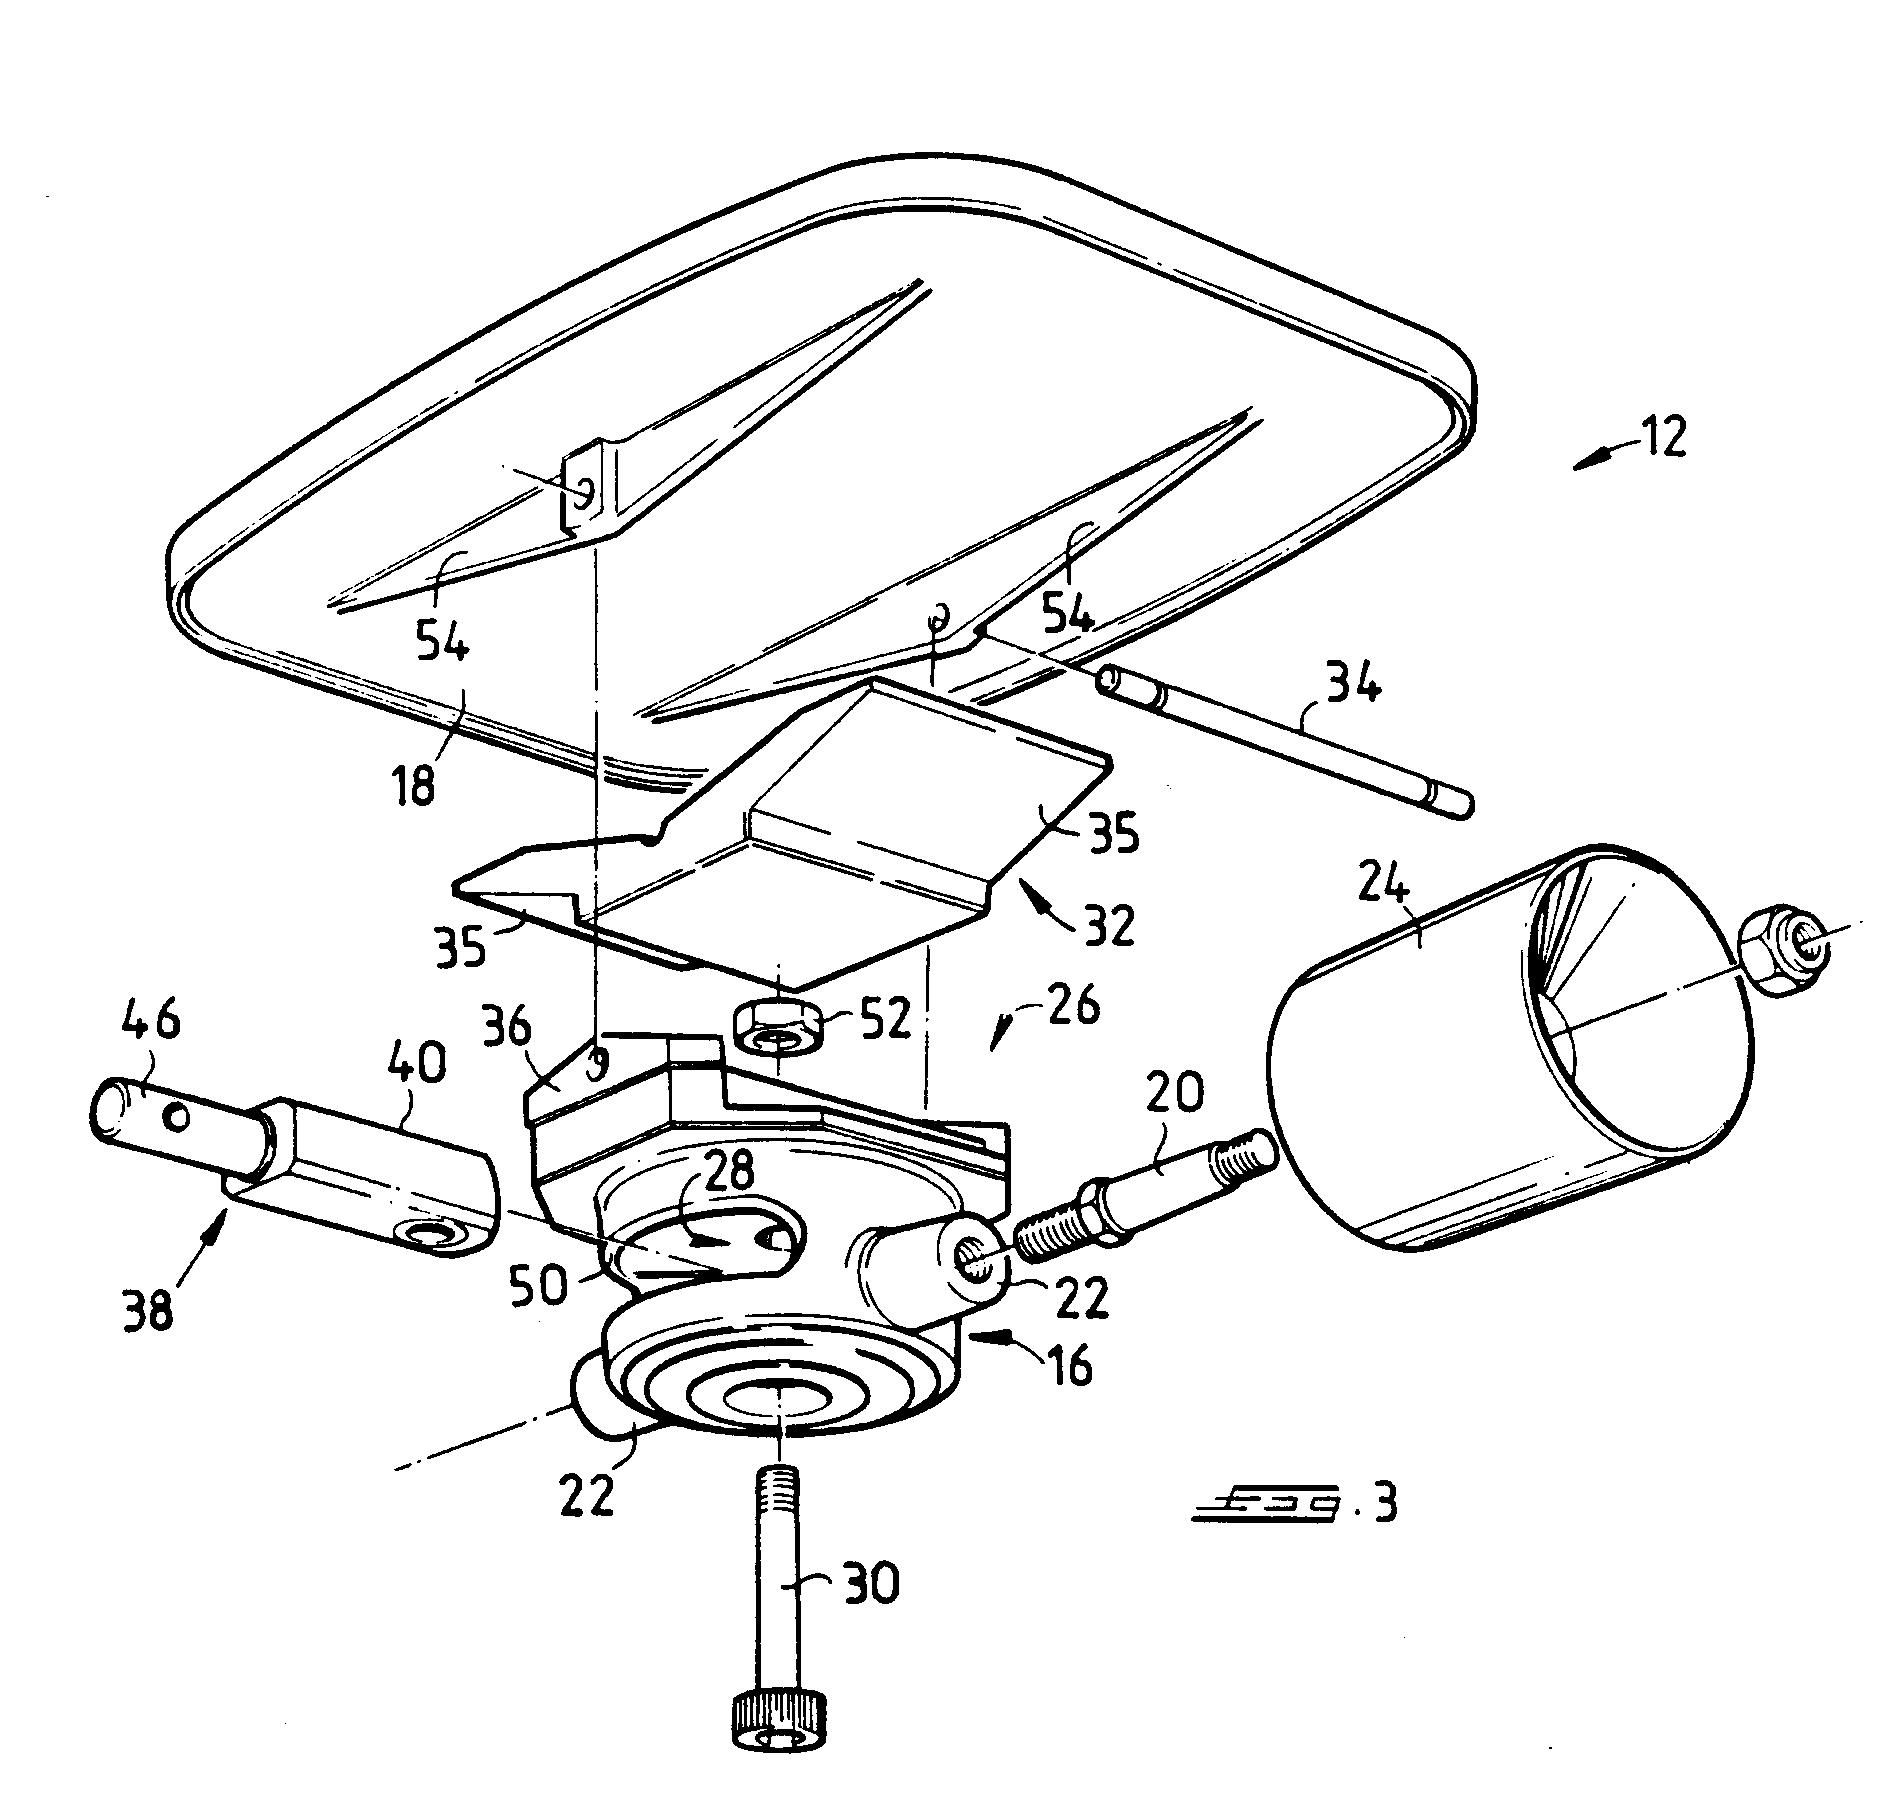 Easily Steered Skateboard Patent: Bidding starts at $25,000 |